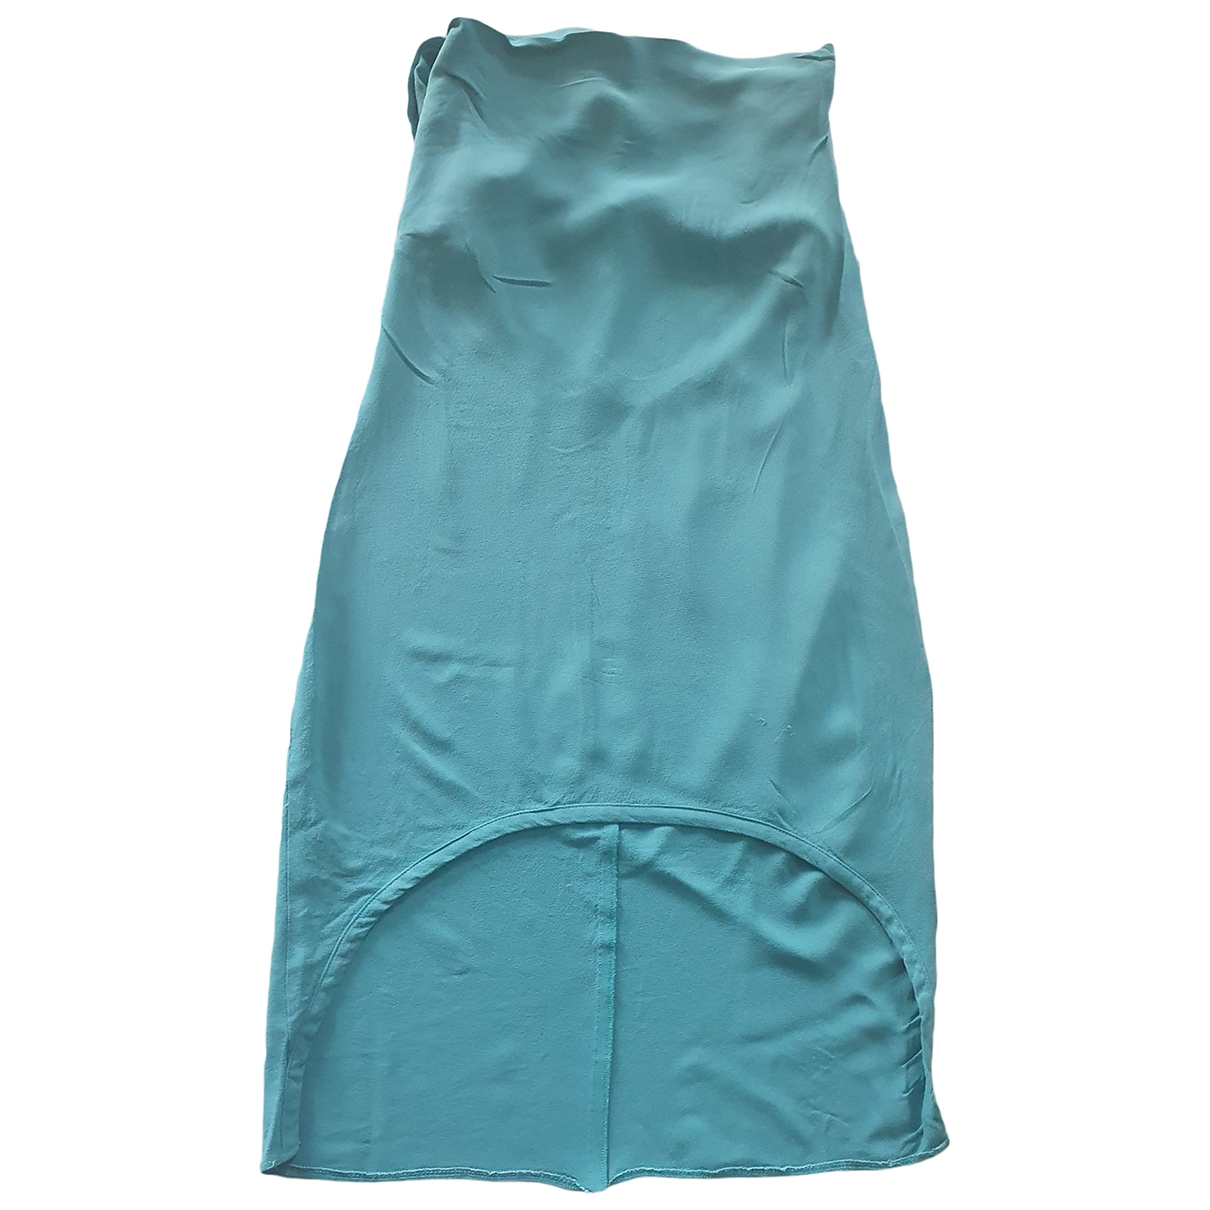 Patrizia Pepe \N Kleid in  Gruen Polyester